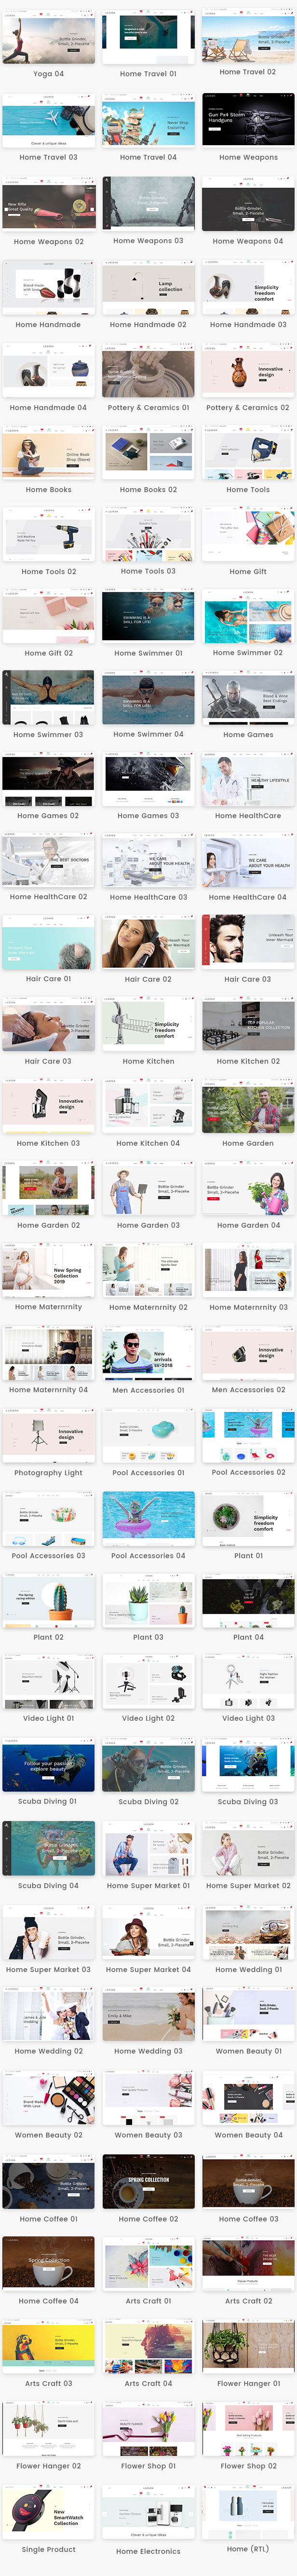 Lezada - Multipurpose Shopify Theme - 6